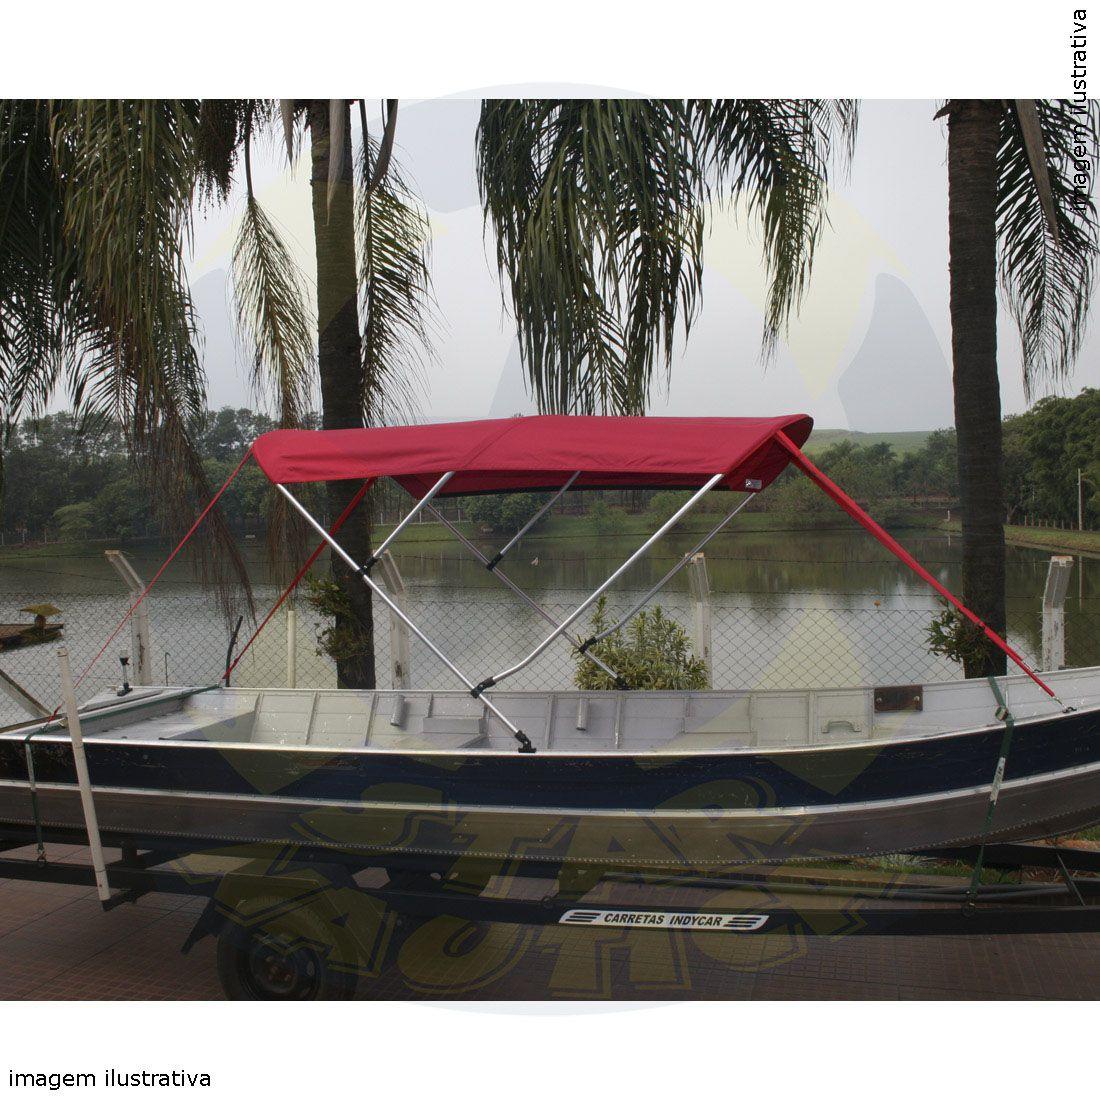 Capota Toldo Barco Karib 600 Vinílica 3 Arcos Tubo 1 1/4